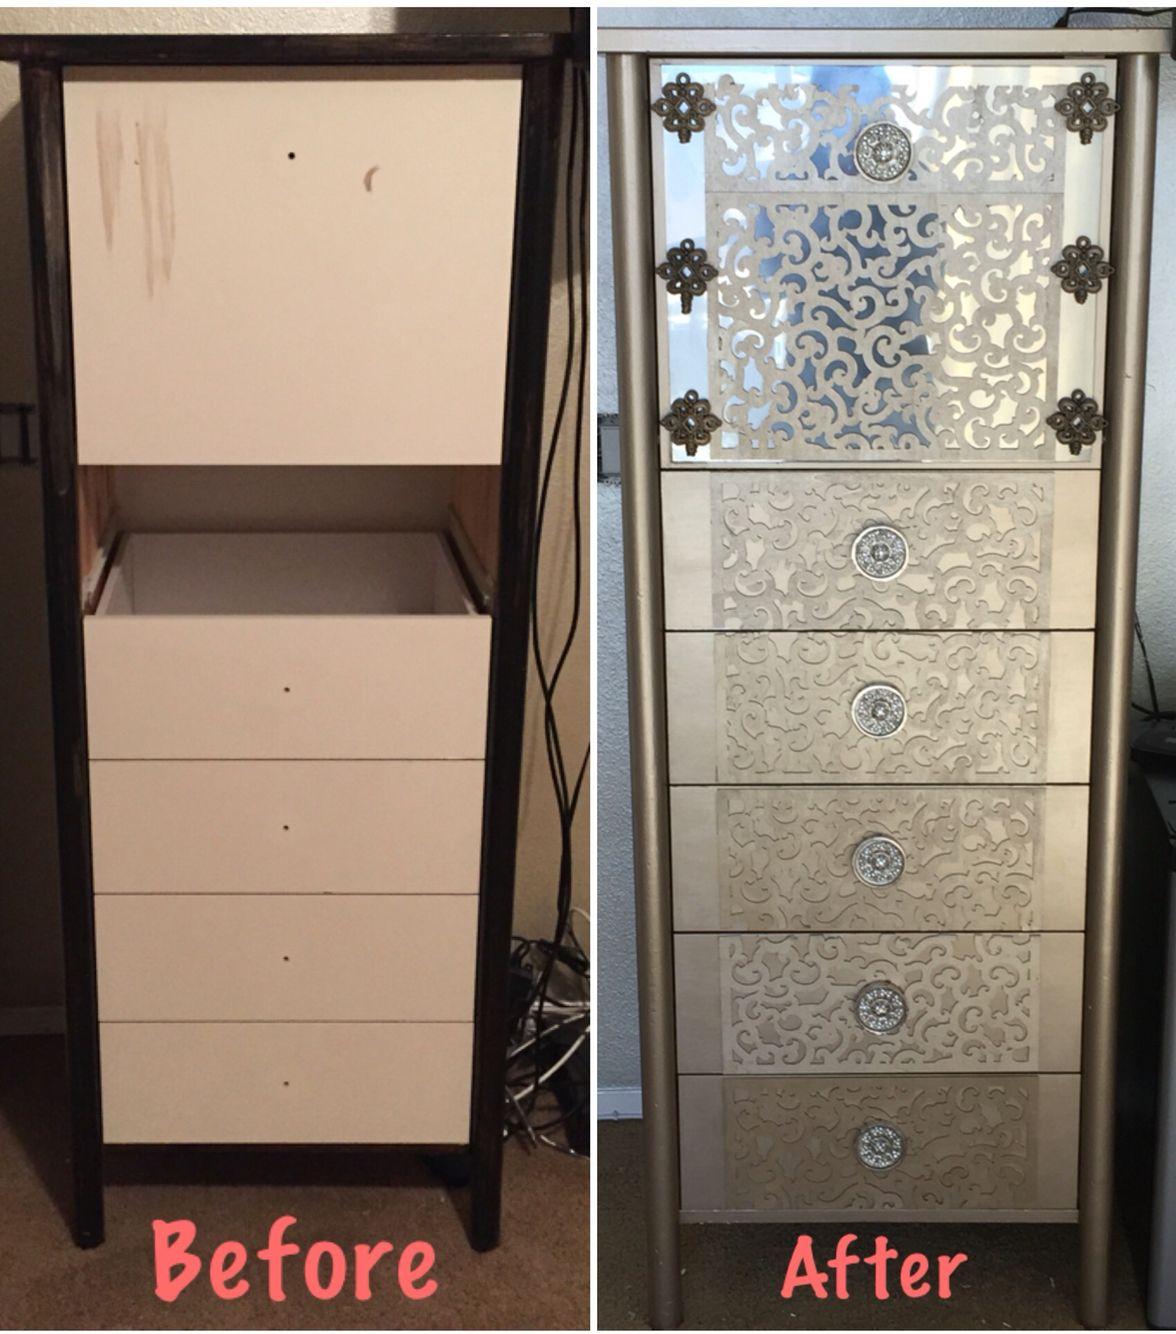 Transformed Thrift Store Find Into Custom Dresser Using Krylon